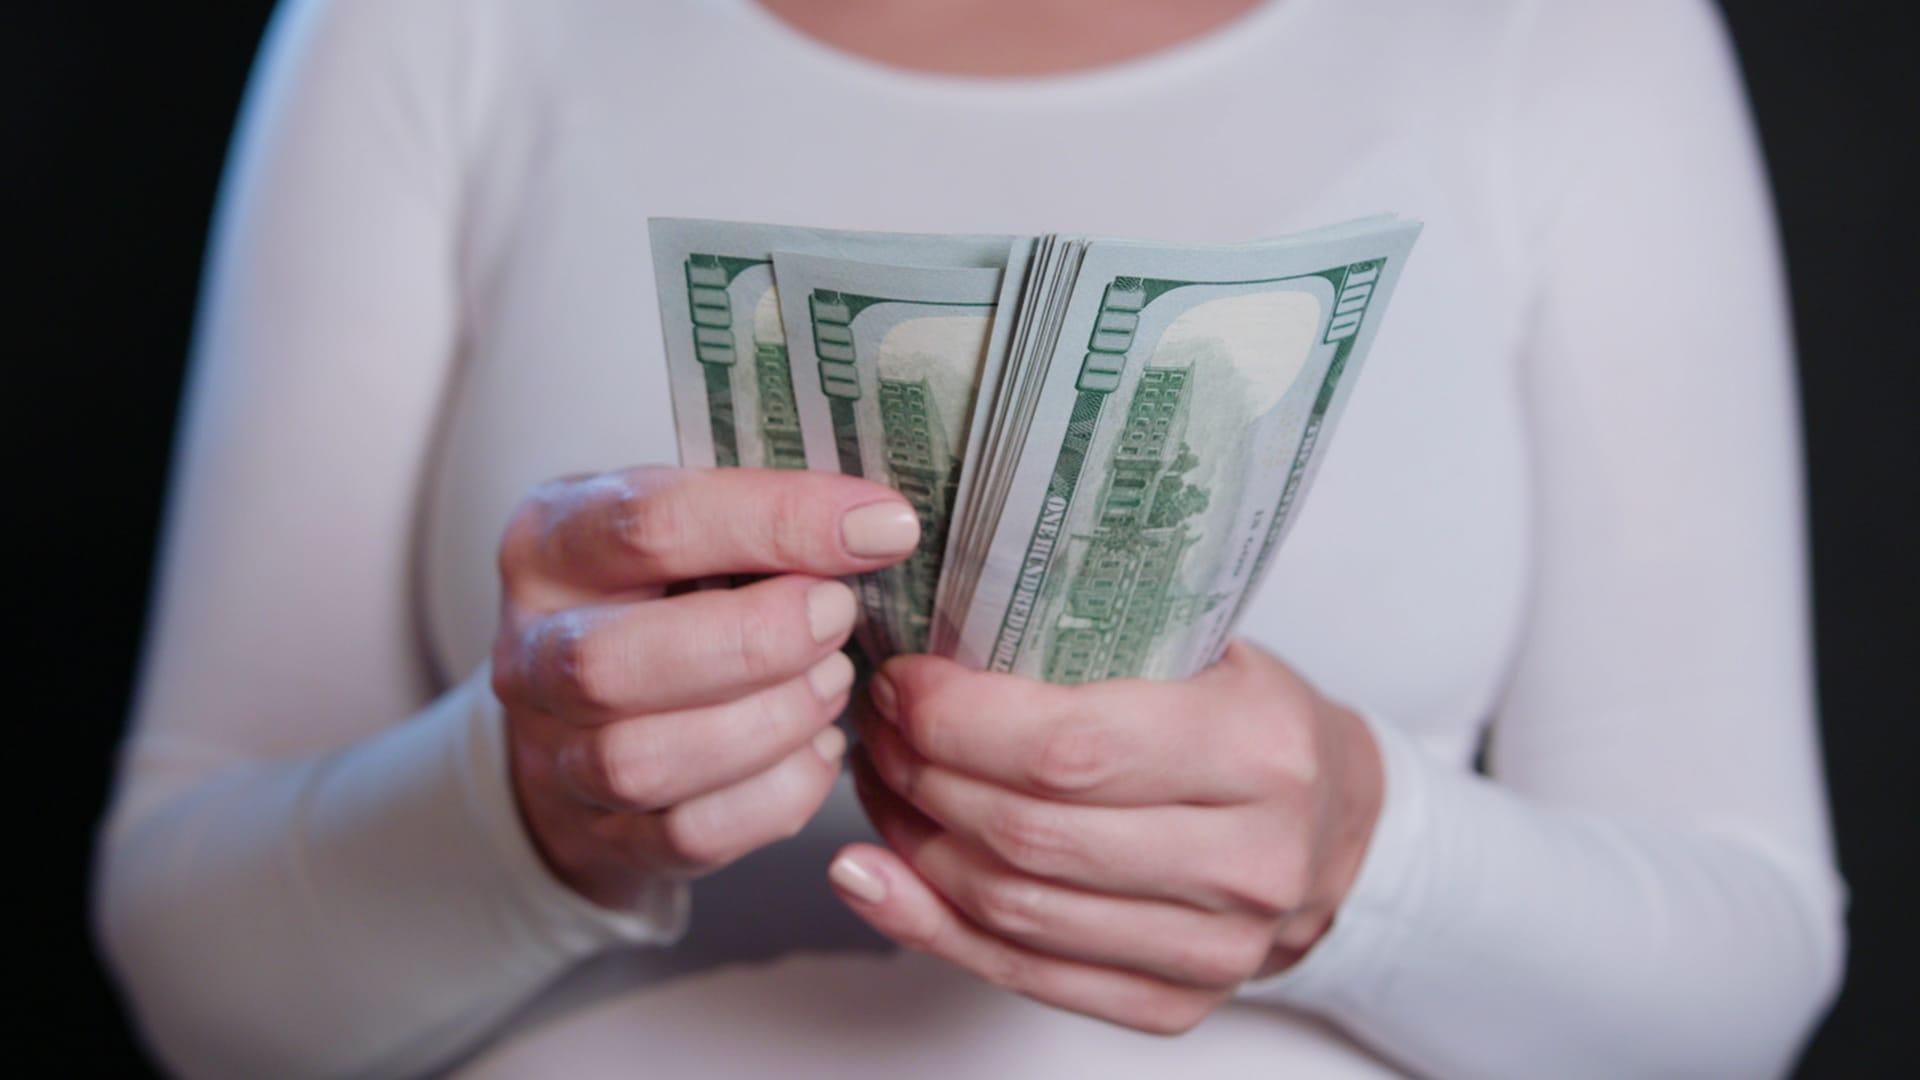 Early retiree Steve Adcock: Saving money won't make you rich